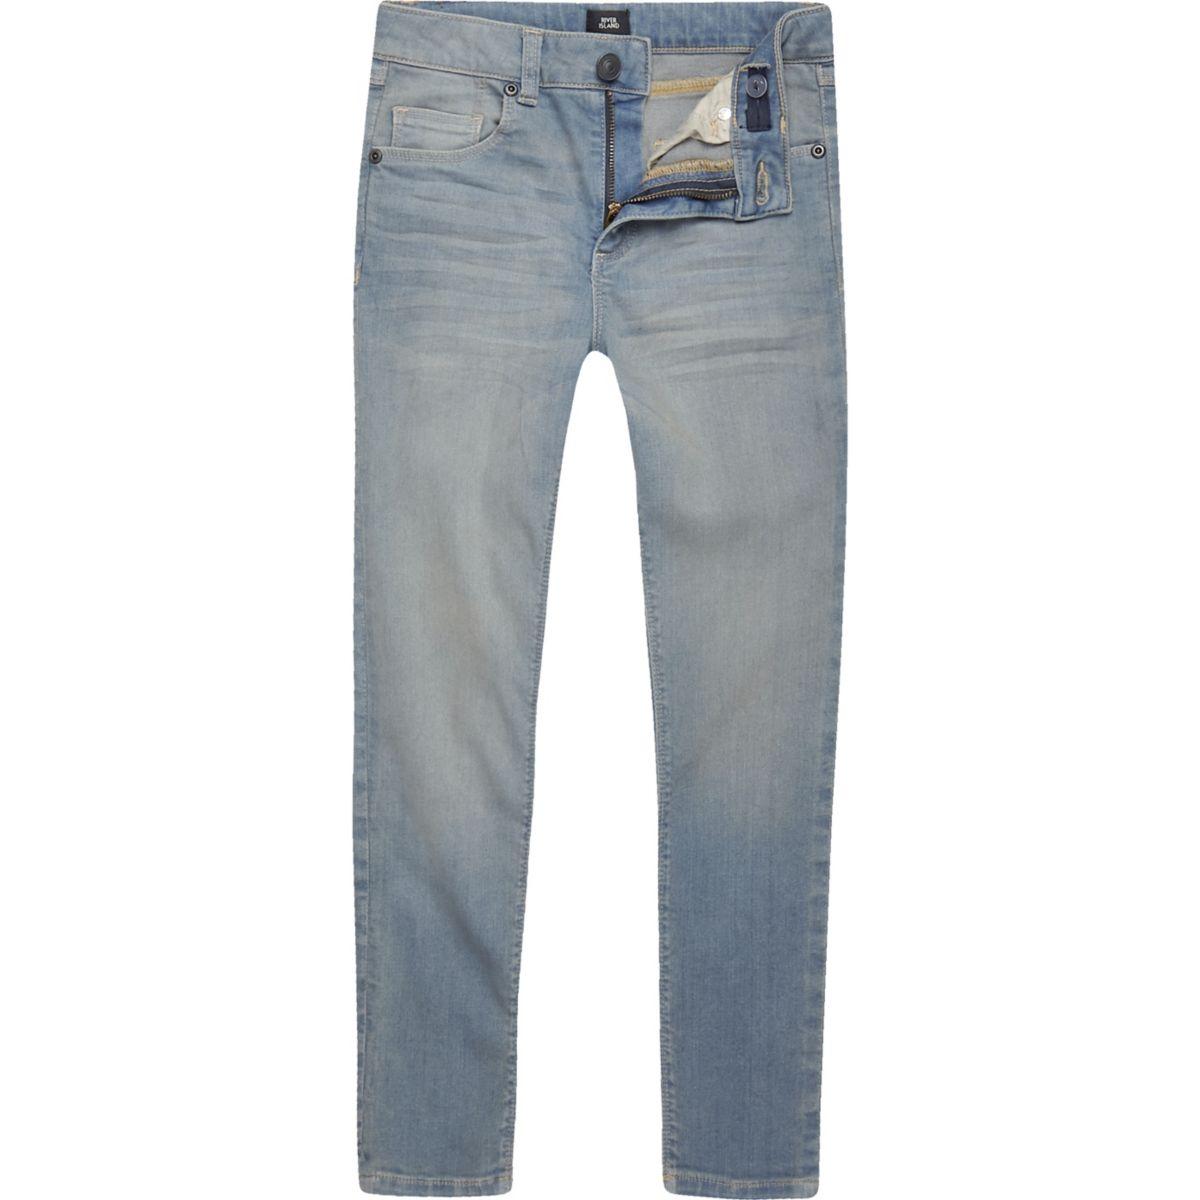 Boys light blue Danny super skinny jeans